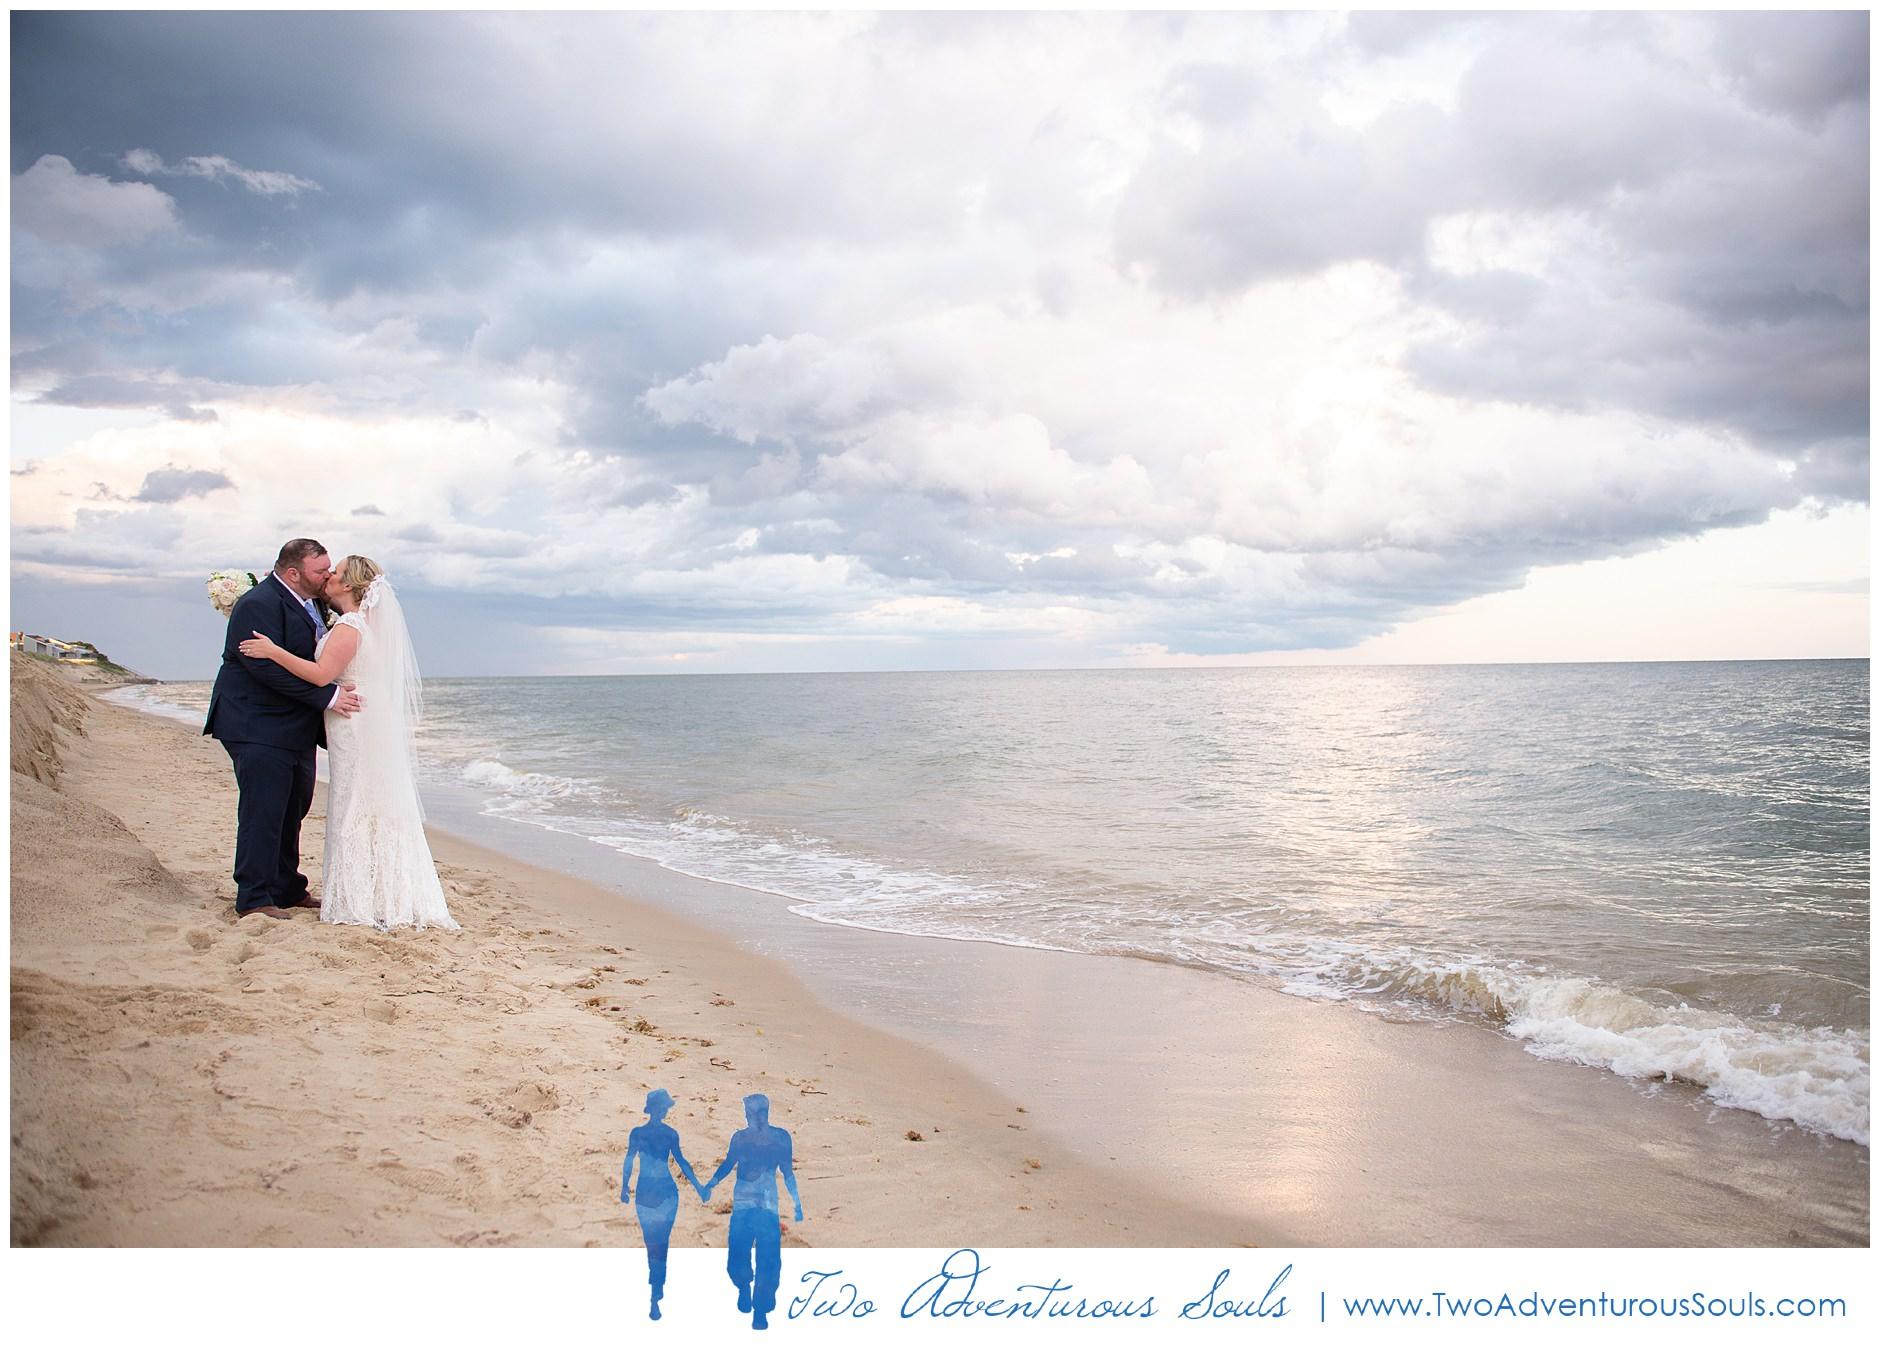 Cape Cod Wedding Photographers, Destination Wedding Photographers, Two Adventurous Souls-081019_0046.jpg